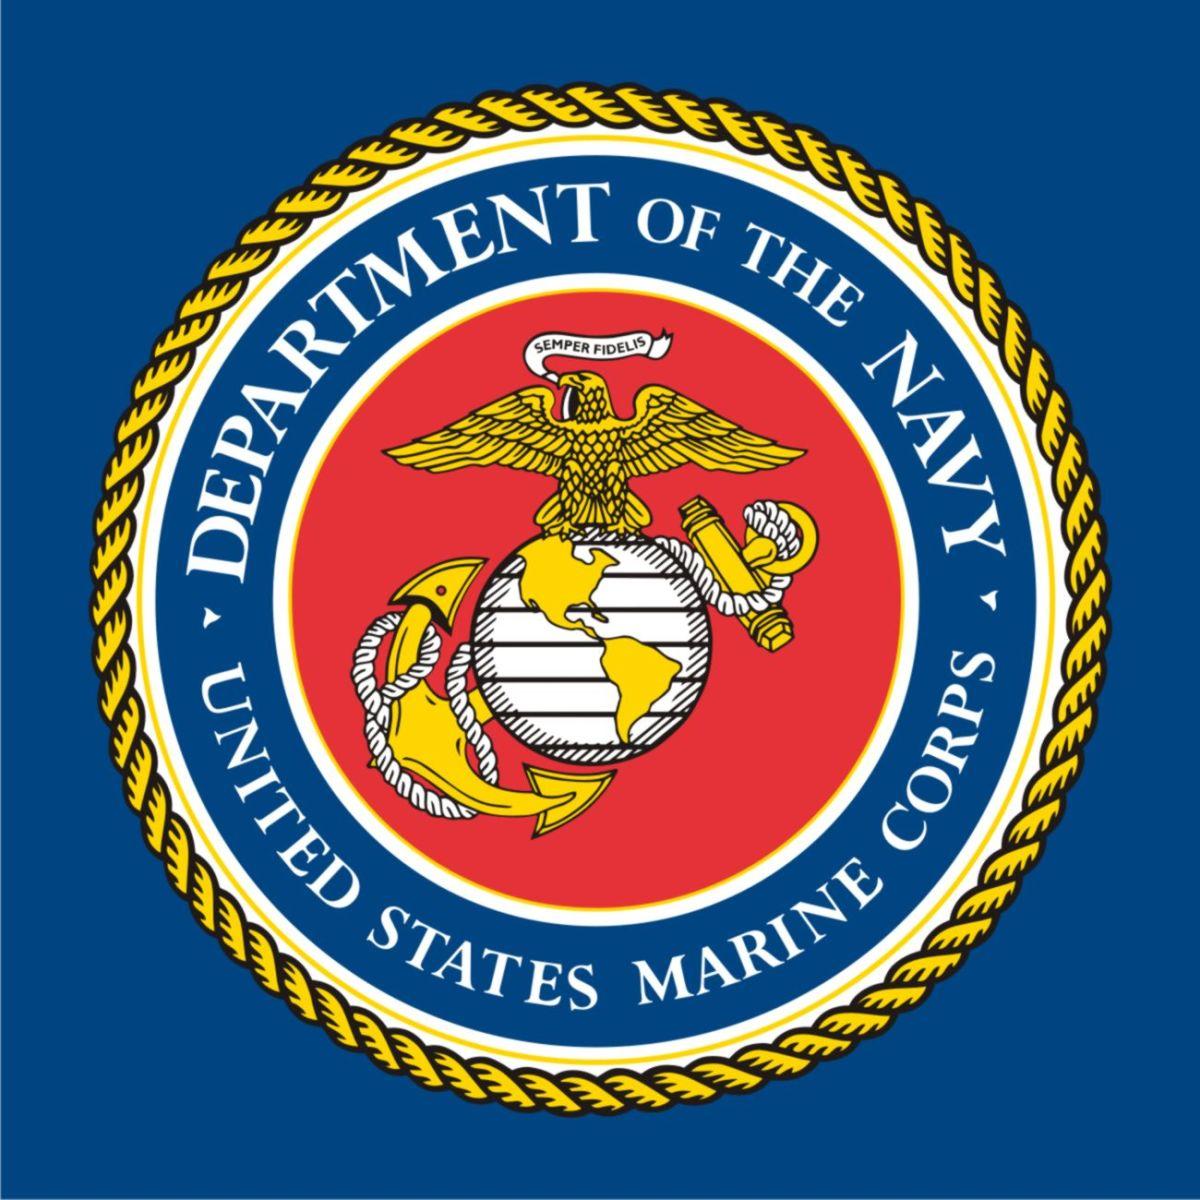 U.S. Marine Corps. Seal vectored.